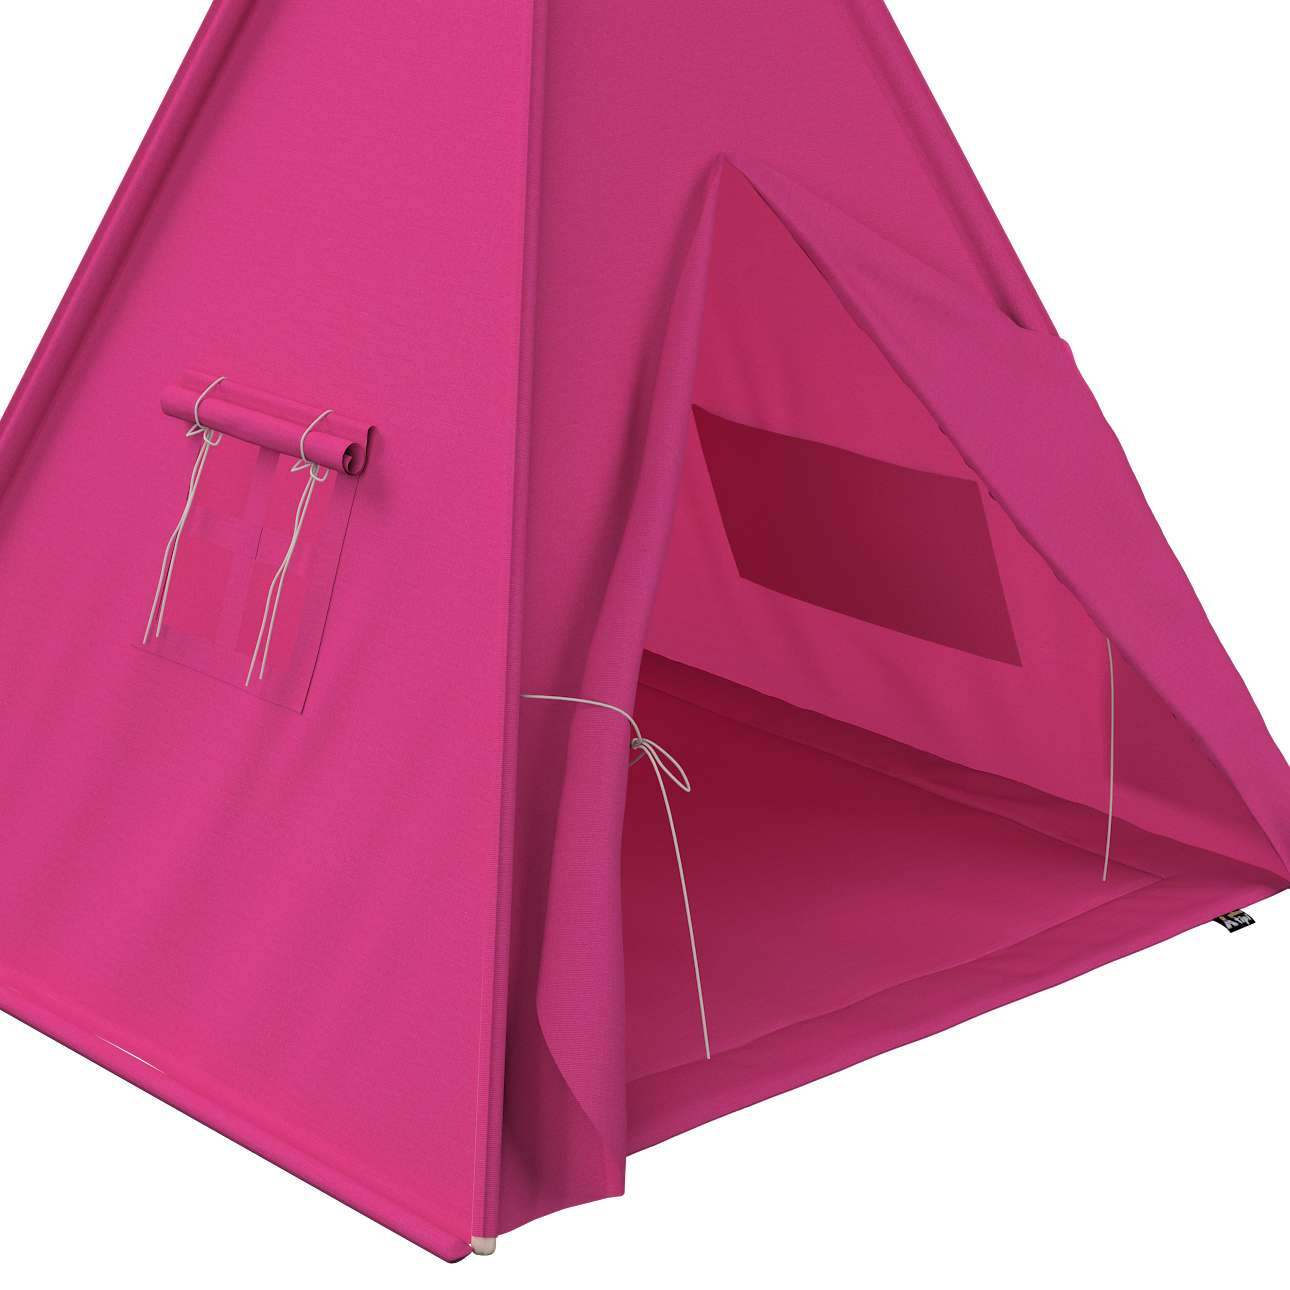 Tipi-Zelt von der Kollektion Happiness, Stoff: 133-60